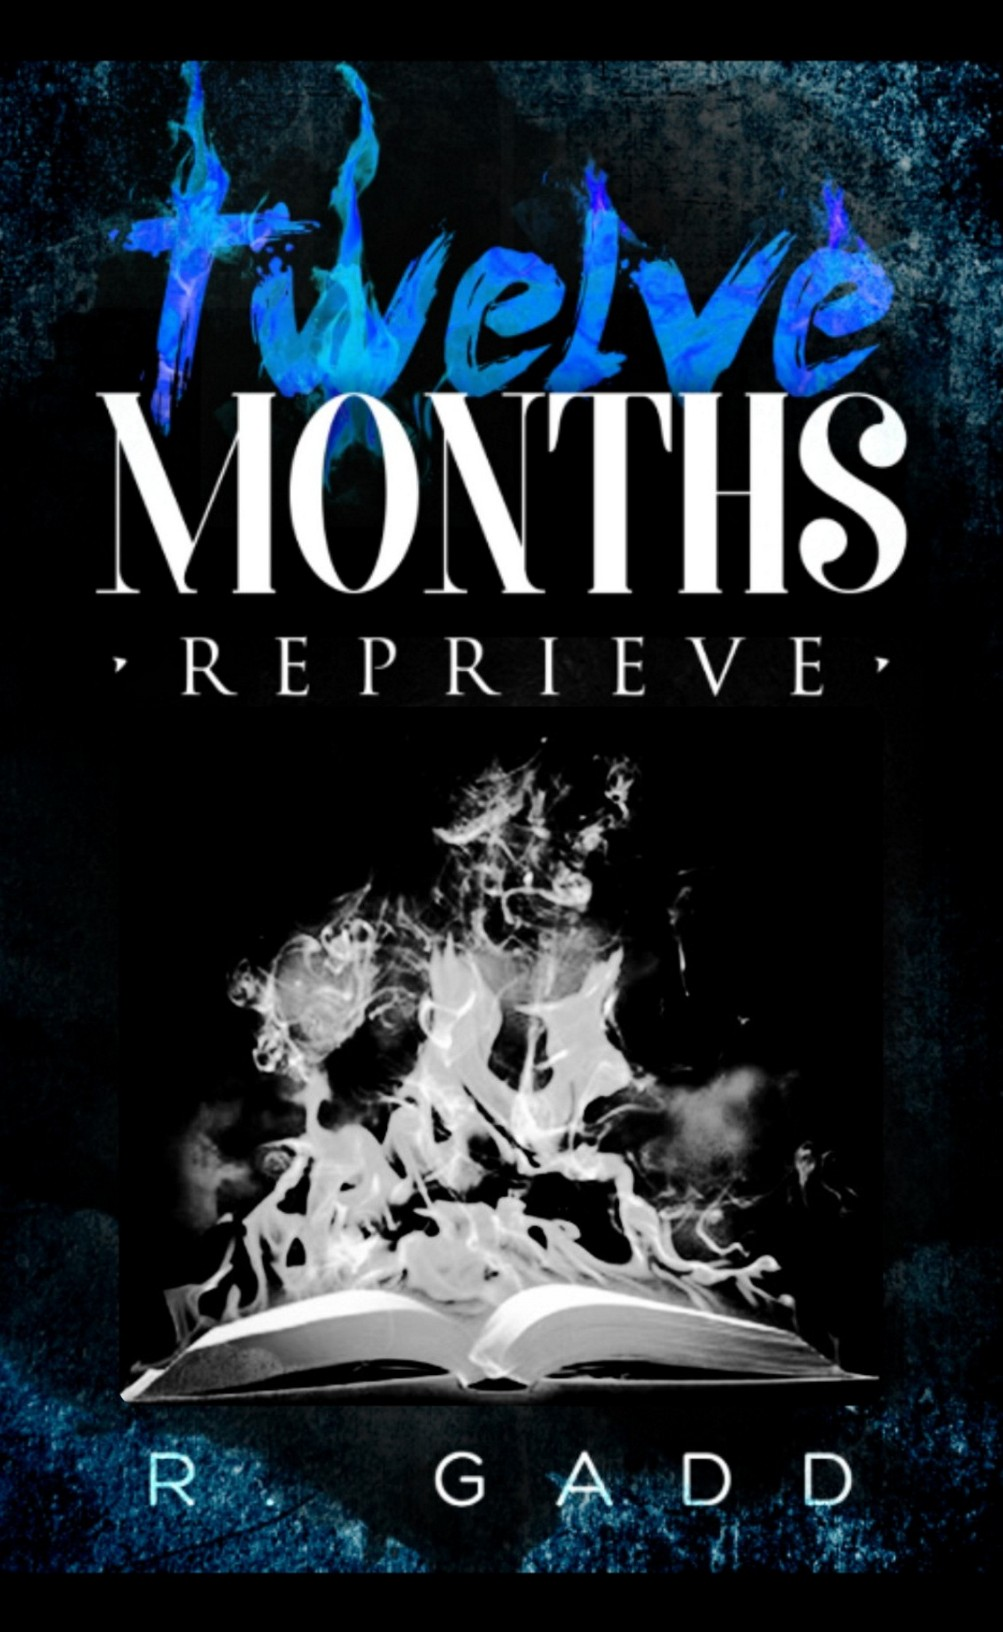 Twelve Months: Reprieve